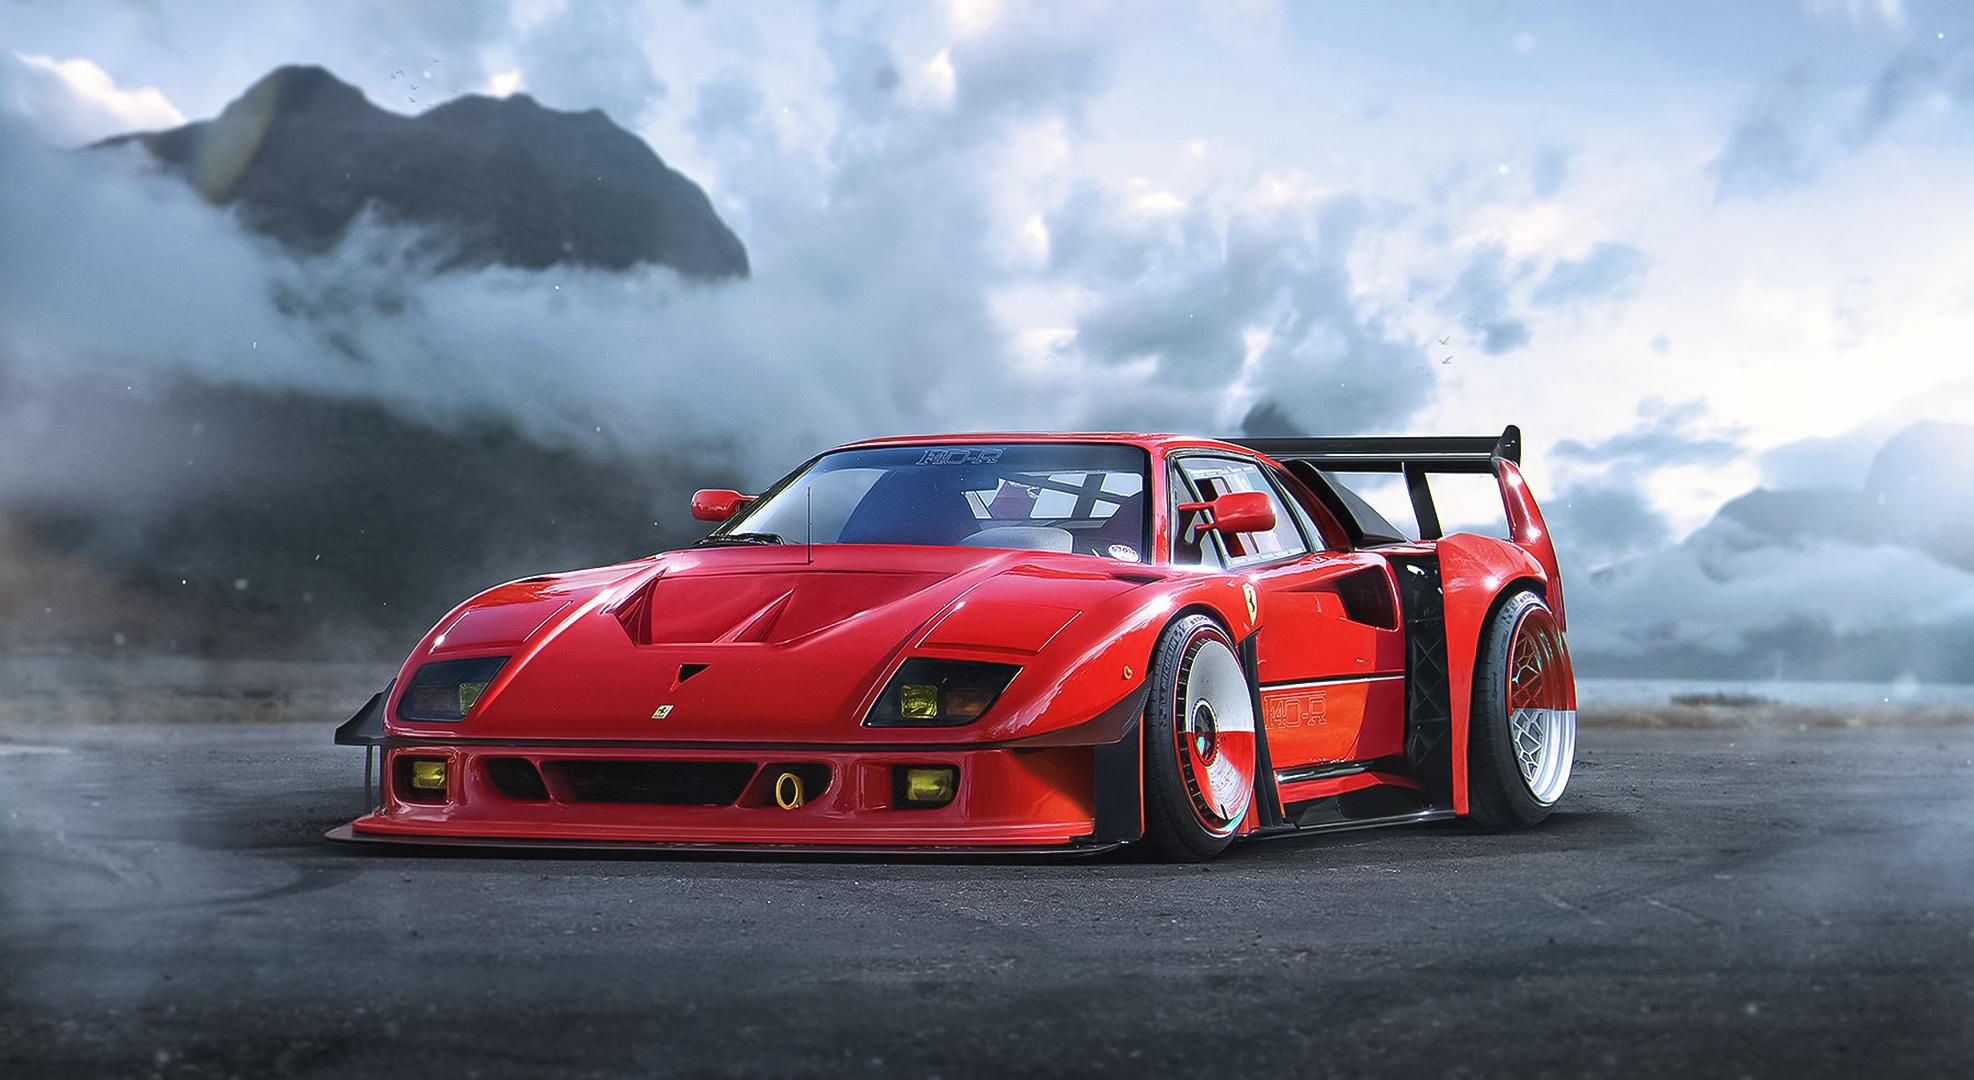 Ferrari F40 Ferrari Supercar Sport Car Red Car Car Vehicle 1974x1080